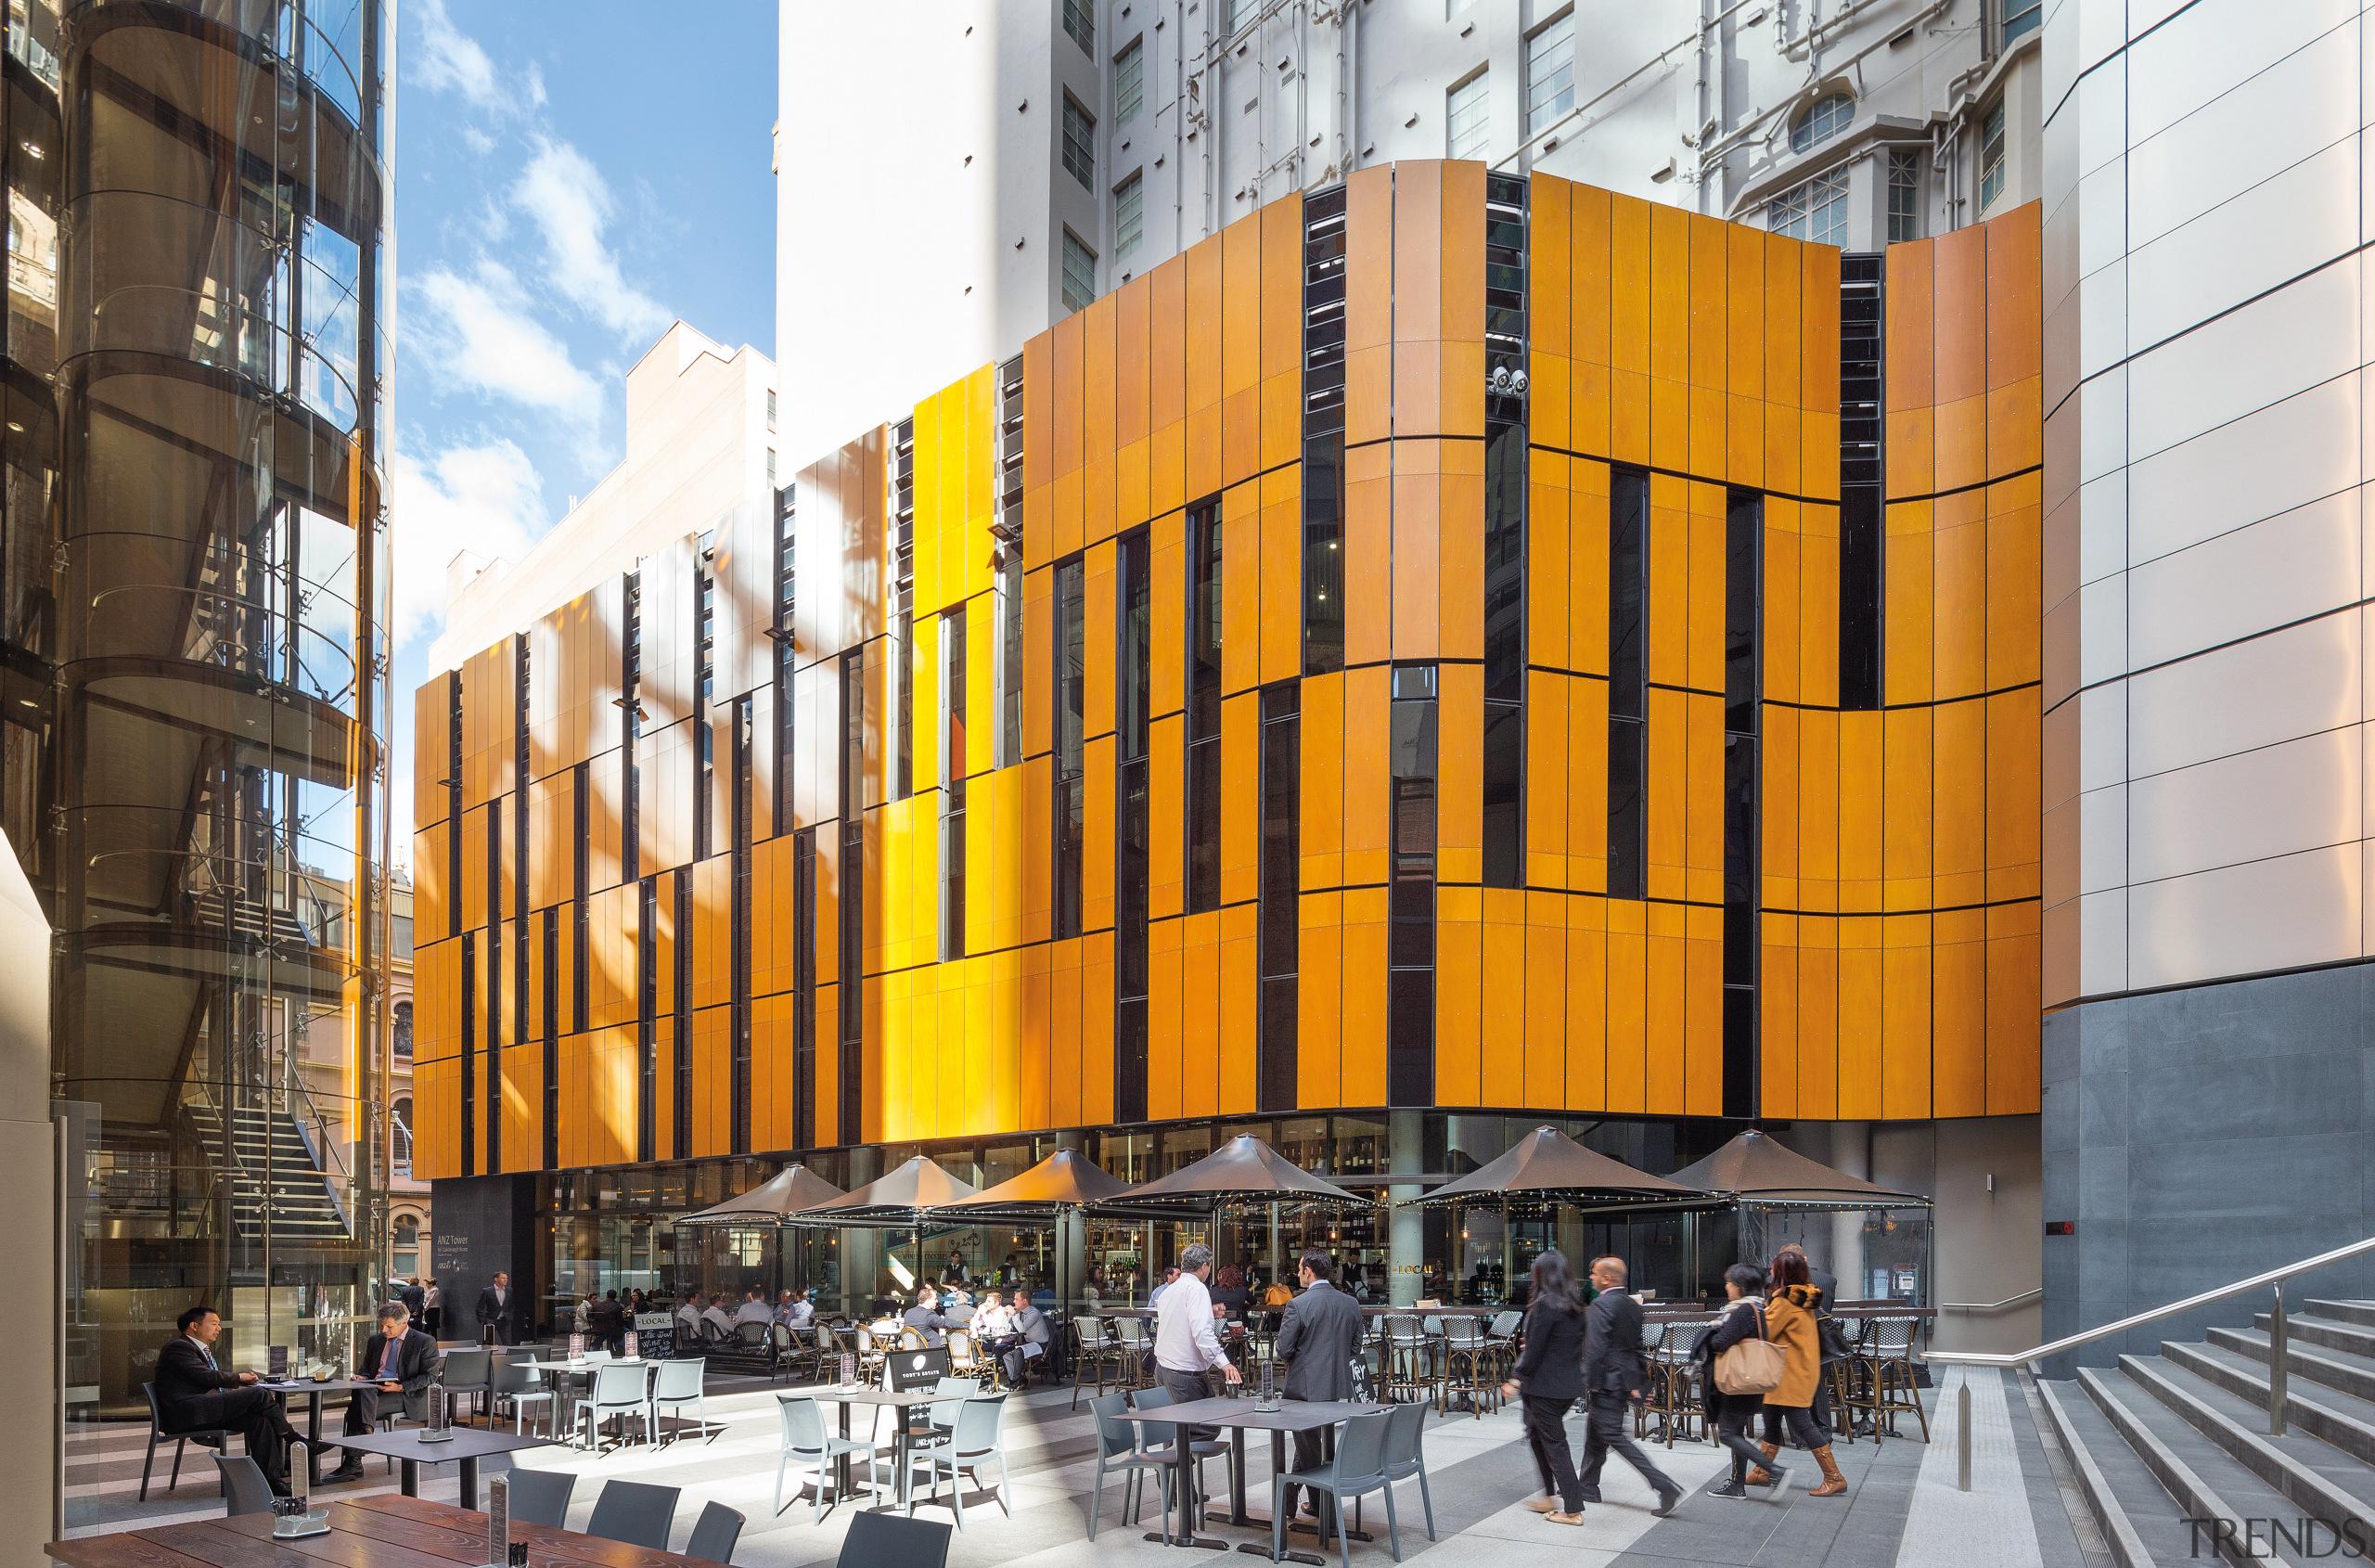 This timber facade curves around the plaza at architecture, building, city, commercial building, facade, metropolis, metropolitan area, mixed use